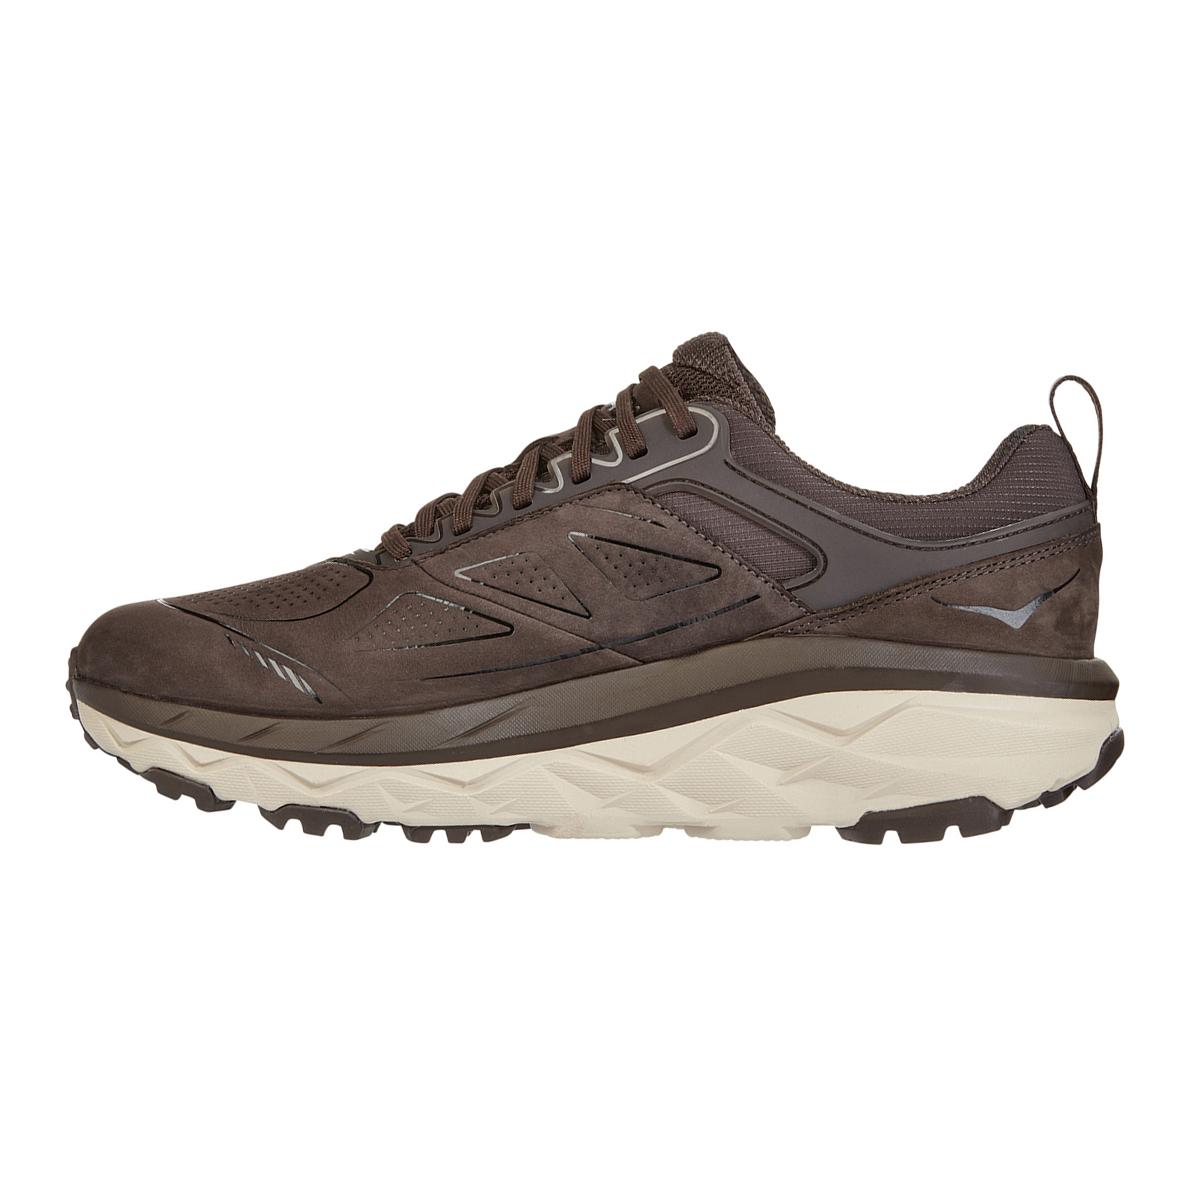 Men's Hoka One One Challenger Low Gore-Tex Trail Running Shoe - Color: Demitasse - Size: 7 - Width: Regular, Demitasse, large, image 2